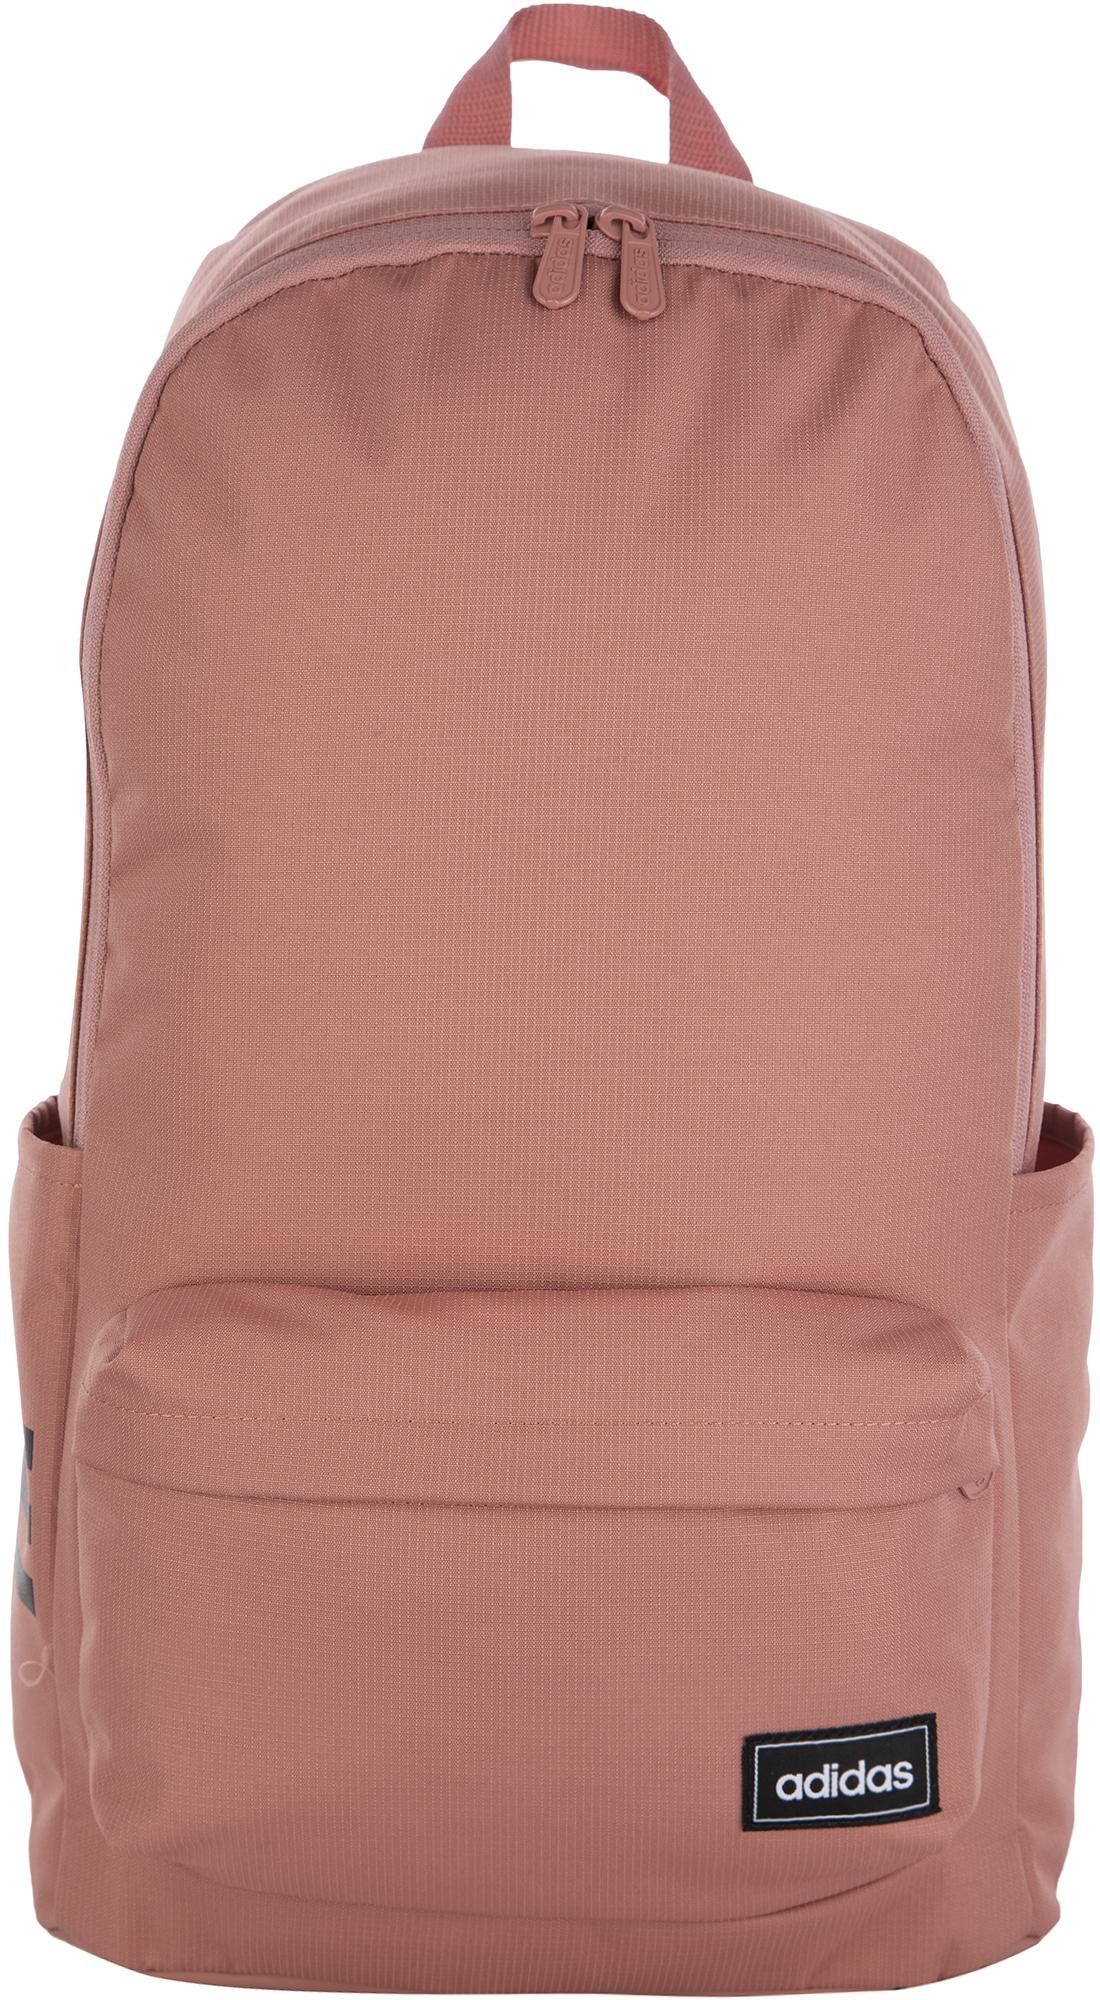 Adidas Рюкзак женский Adidas Classic 3-Stripes hanerou cute keychain рюкзаки для девочек мода tassel женщины рюкзак женский красочный daypack schoolbag кожаные наплечные сумки